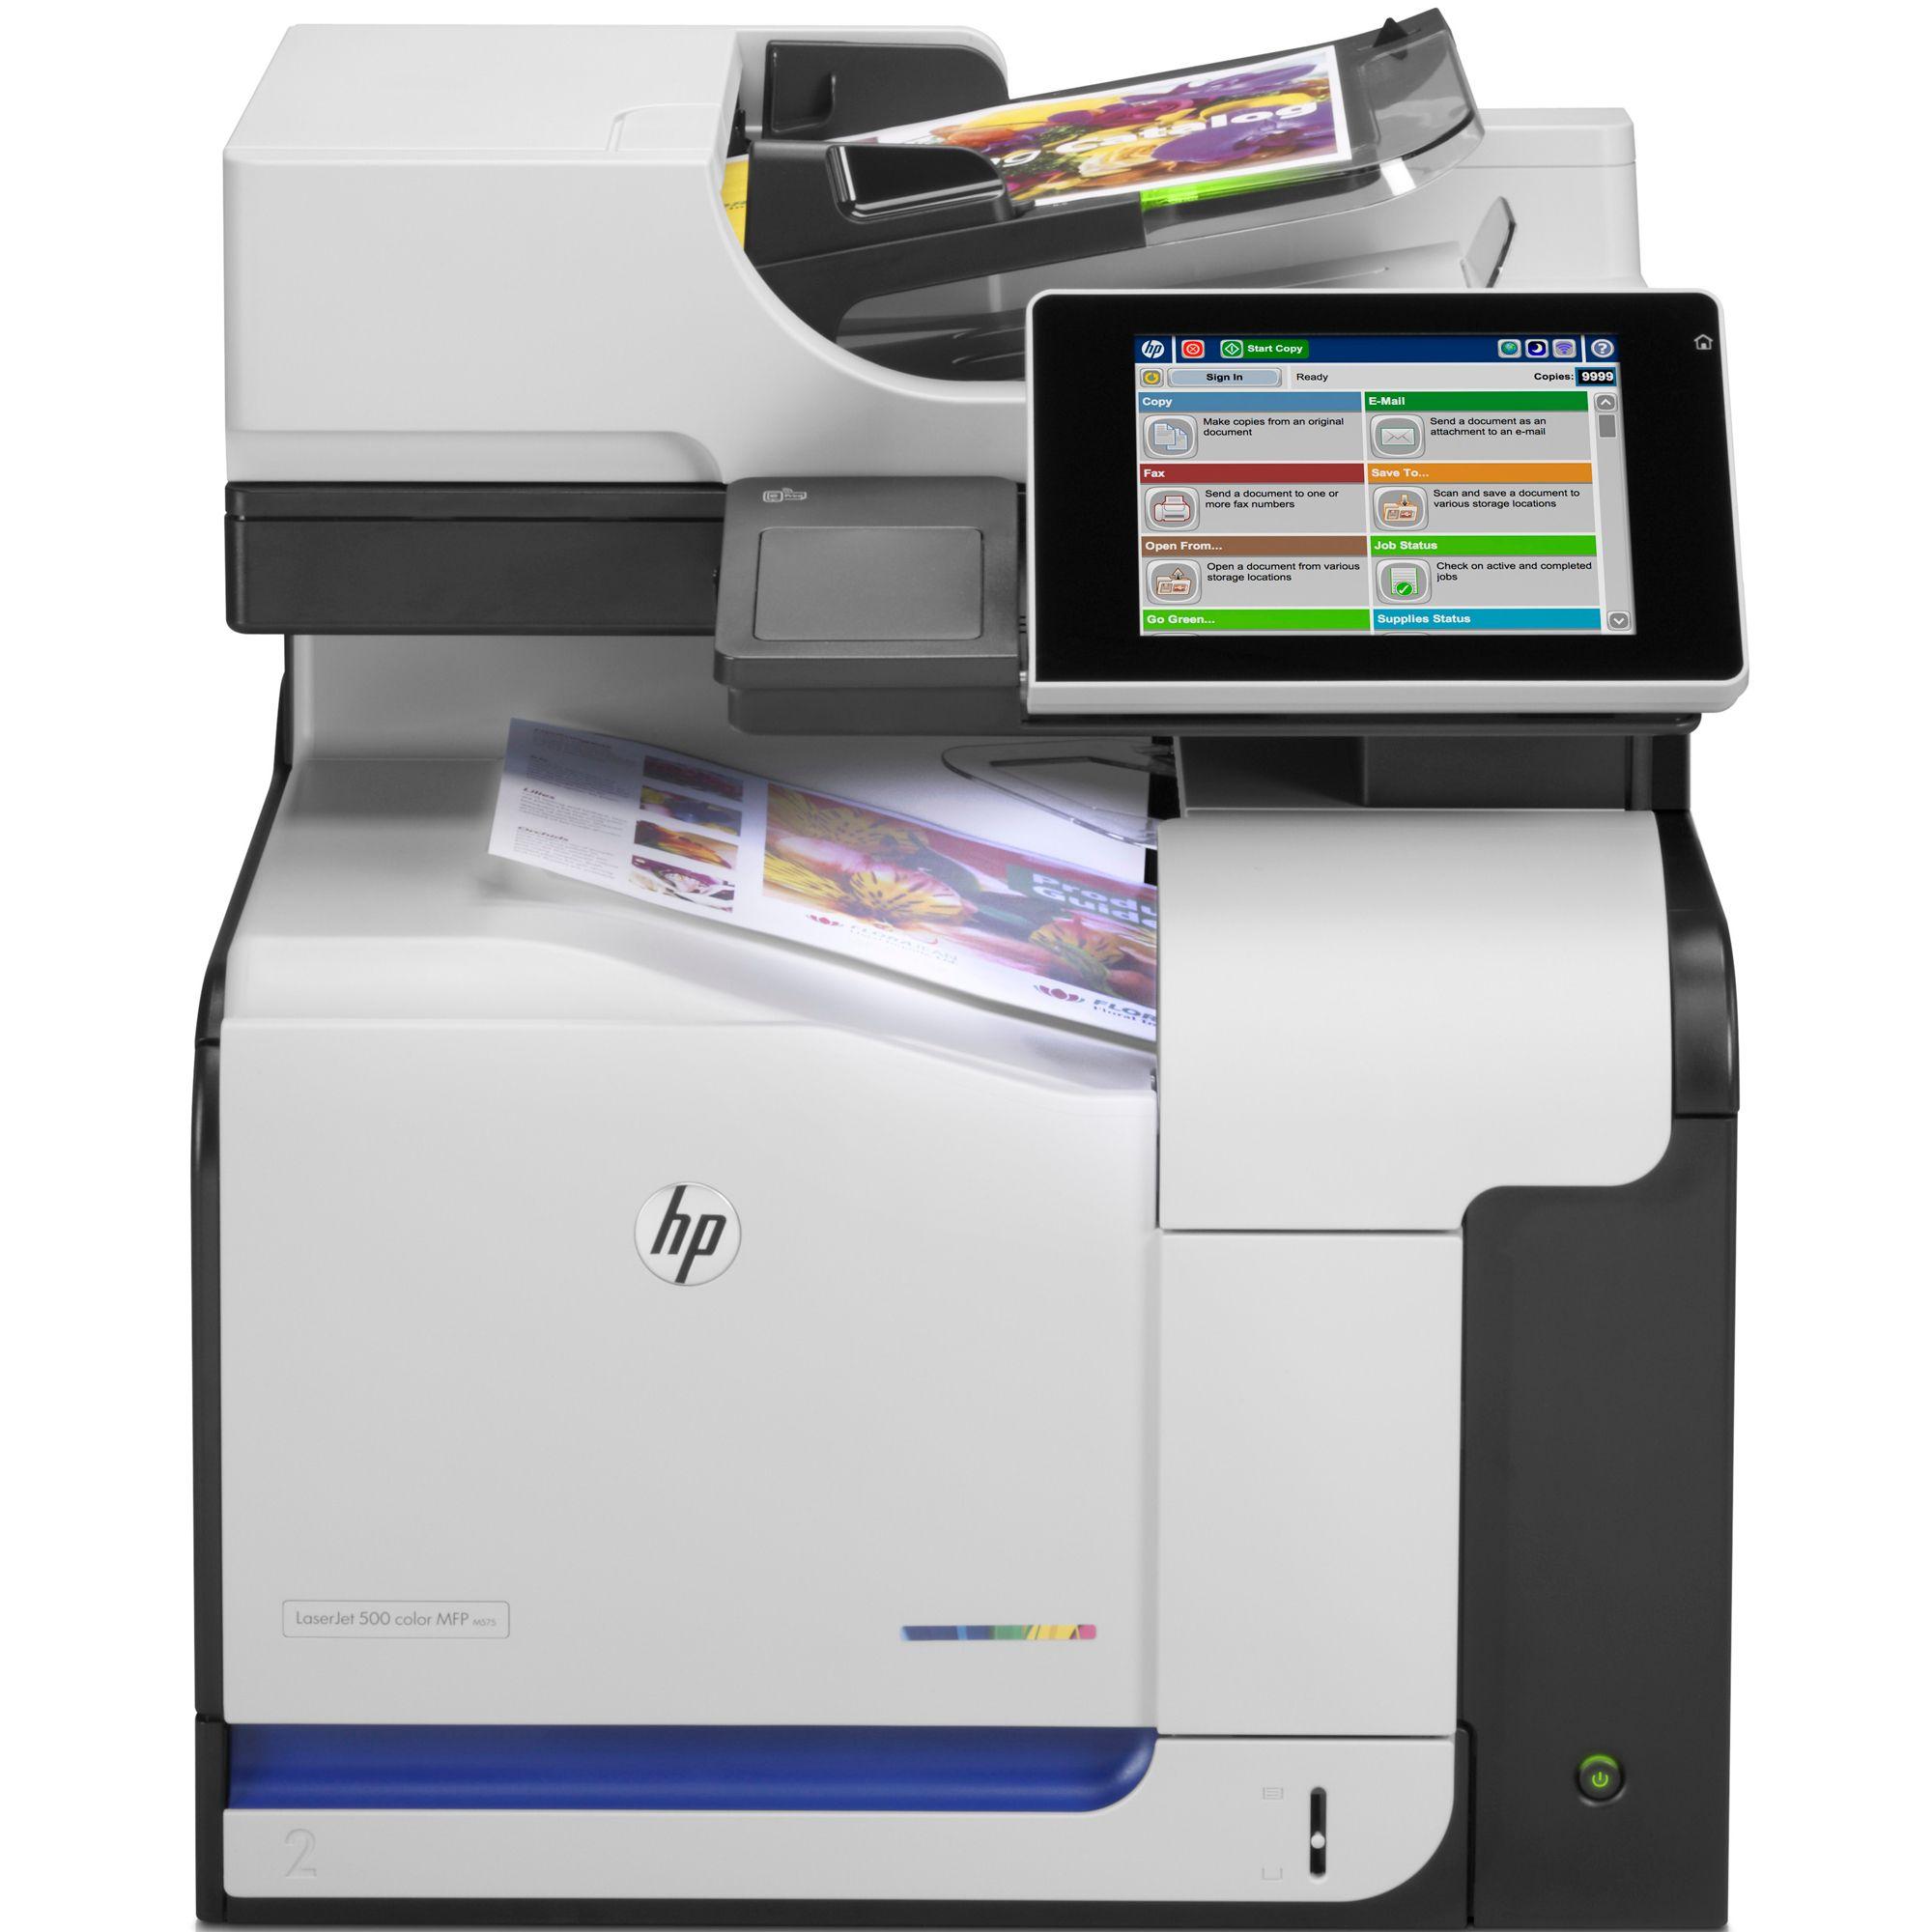 LaserJet 500 color MFP M575dn